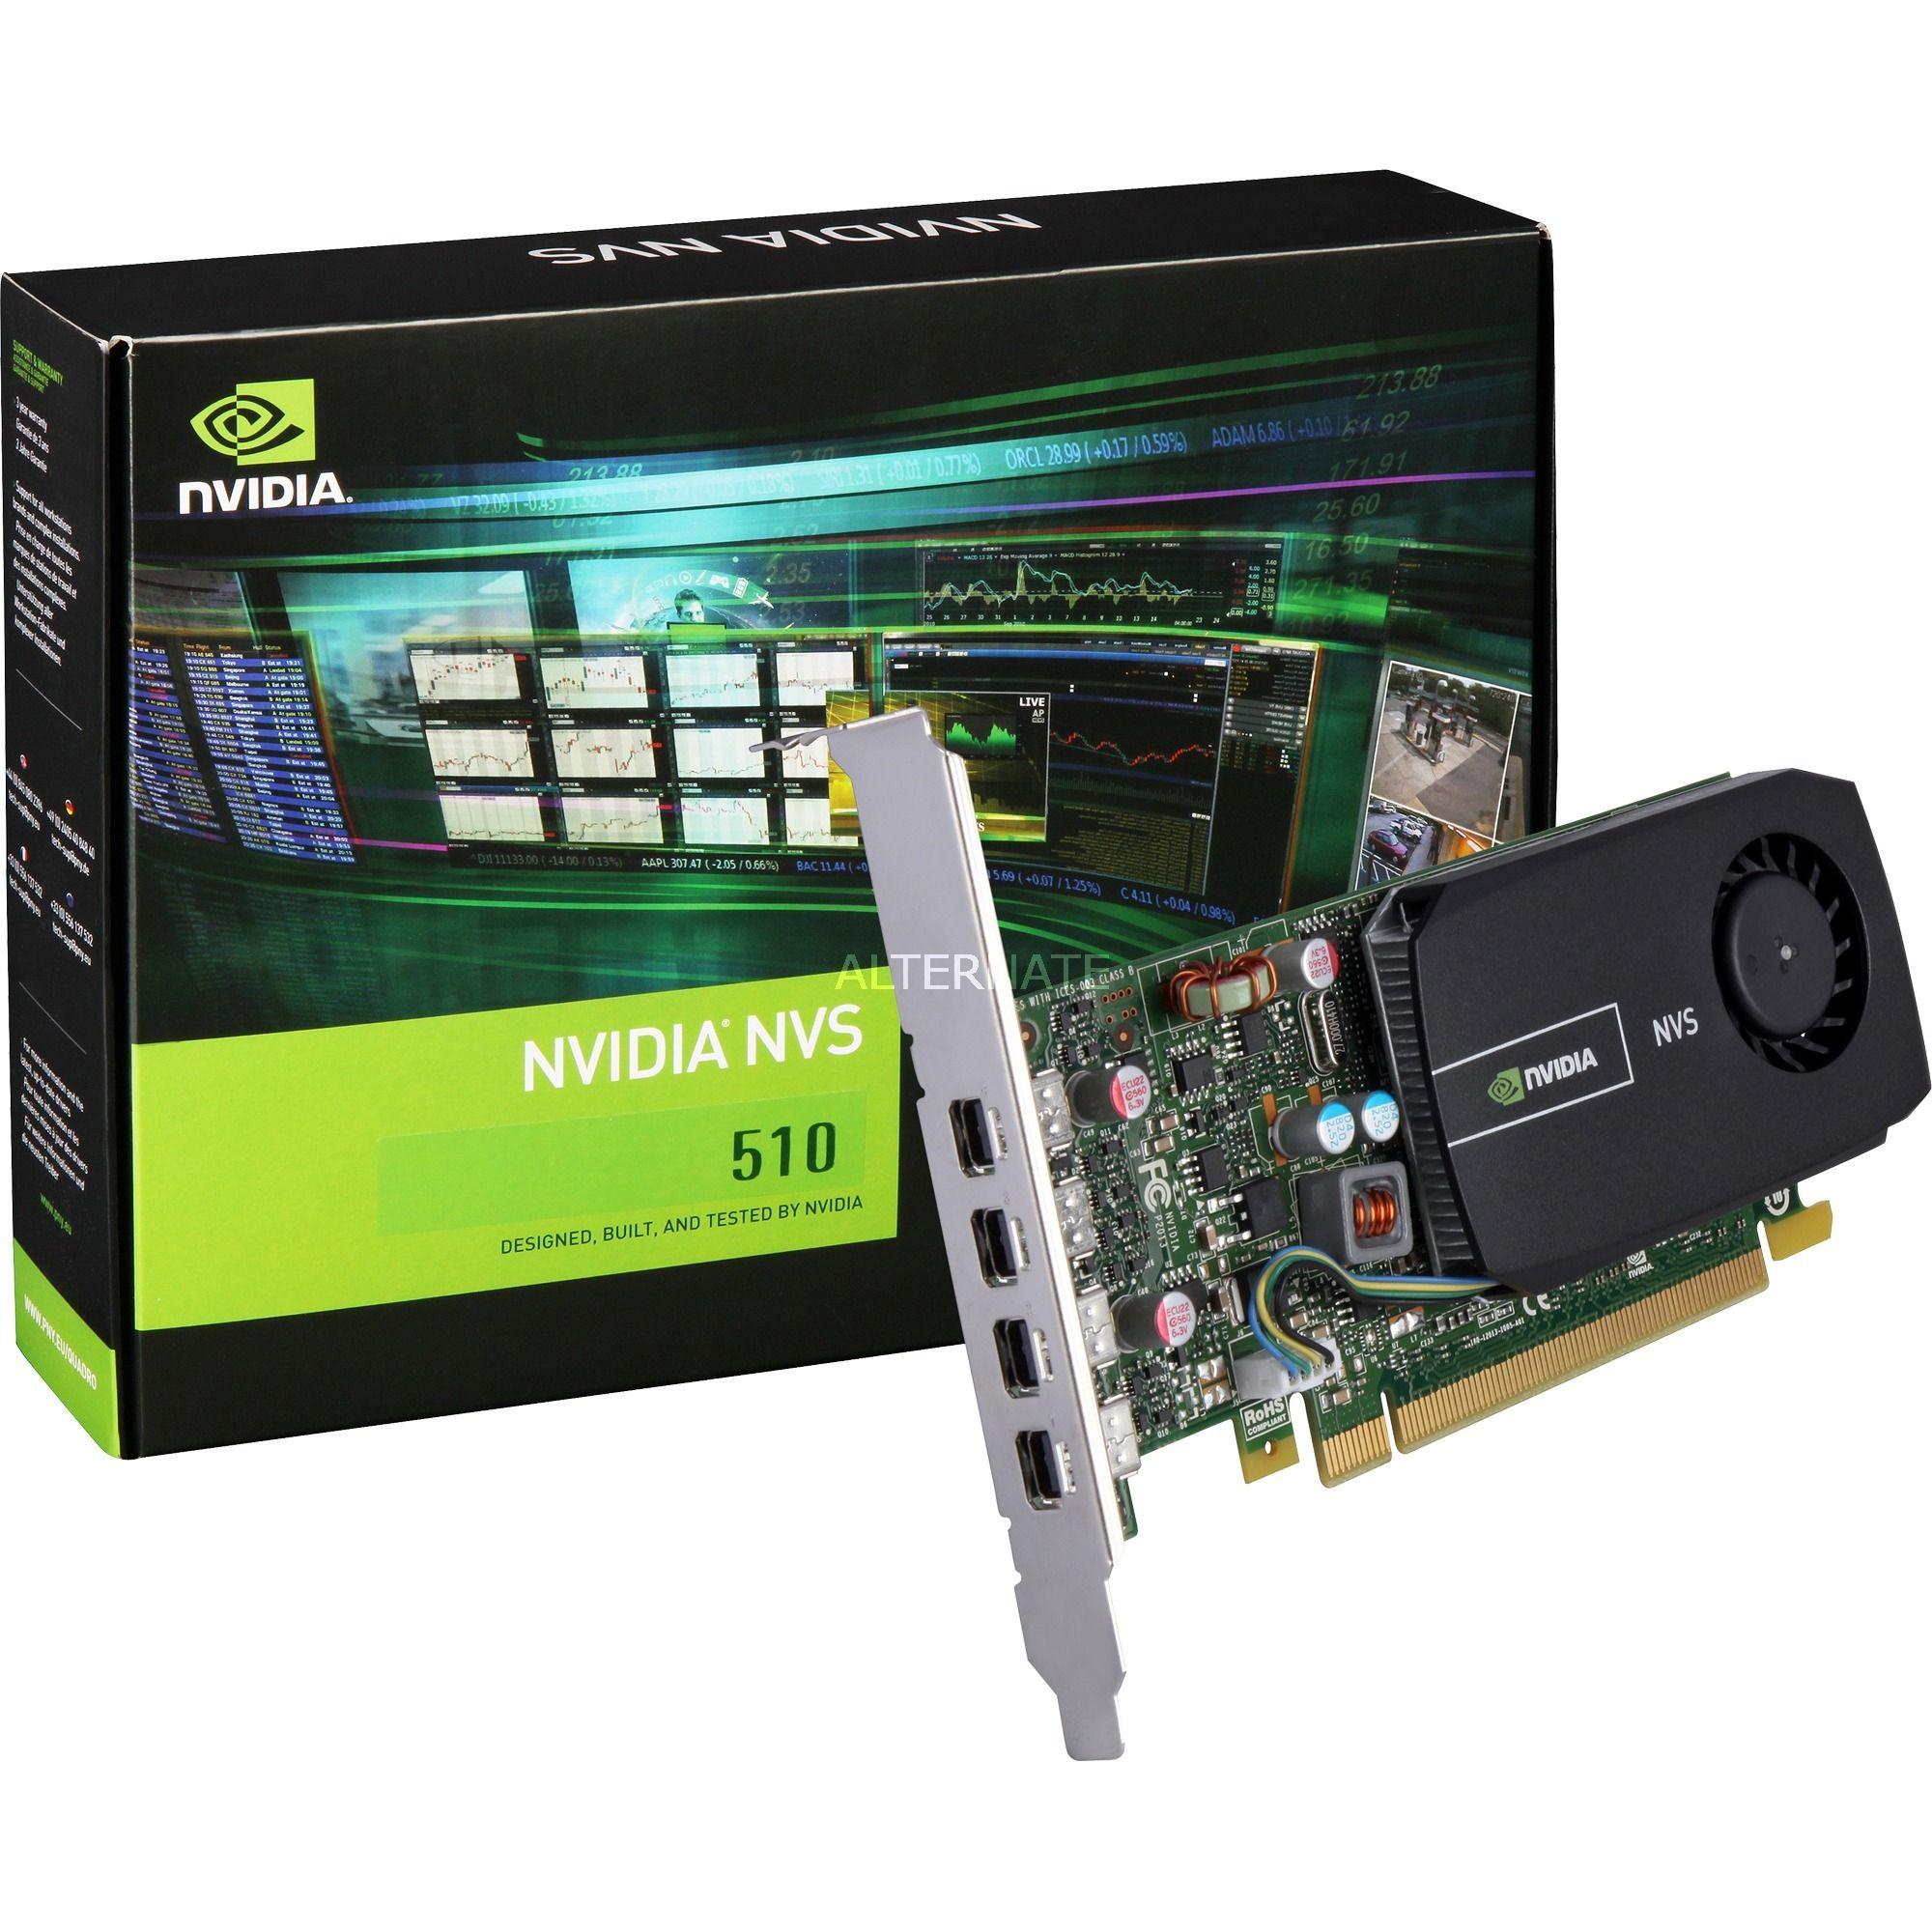 R9 280x Tri X Carte Graphique Nvidia Geforce 8800 Gtx Prix